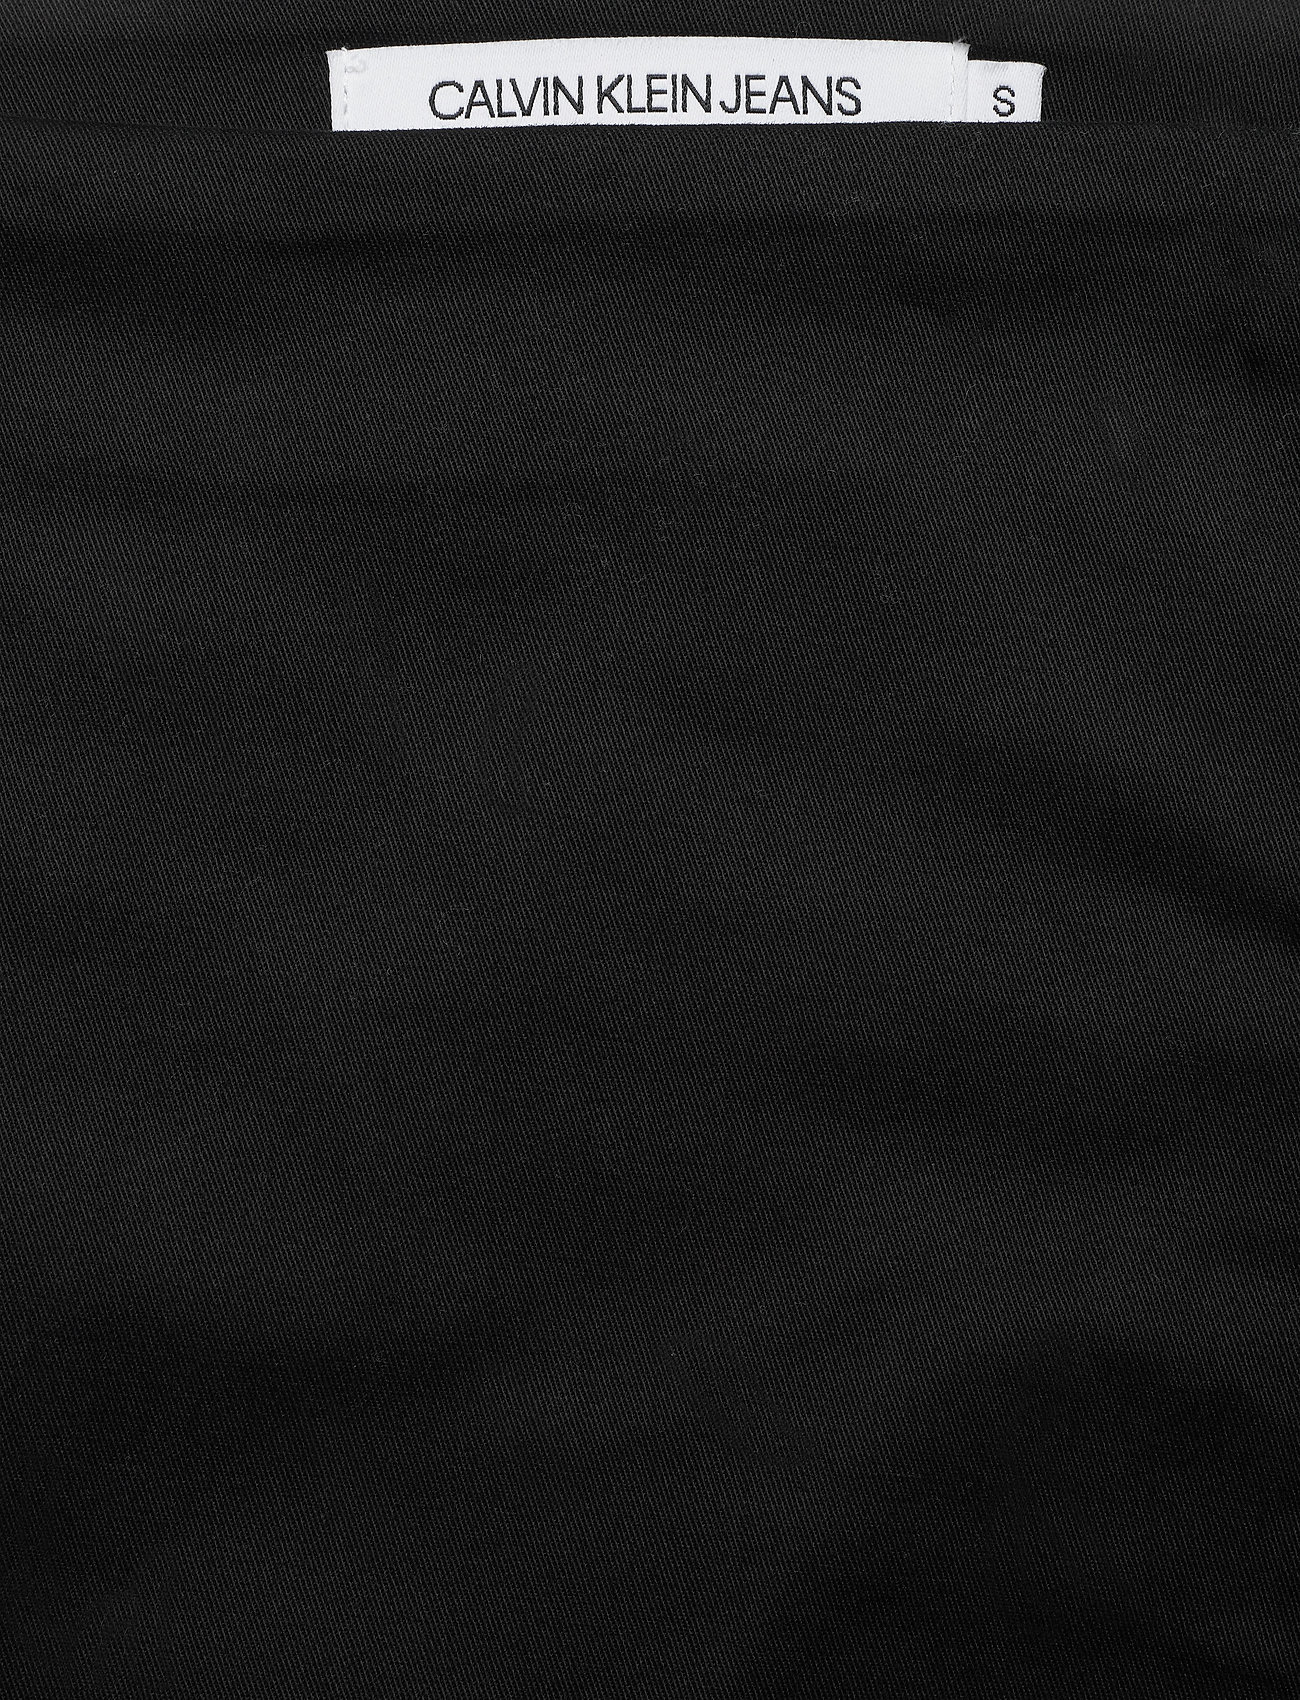 Buckle Logo Strap Skirt (Ck Black) (900 kr) - Calvin Klein Jeans